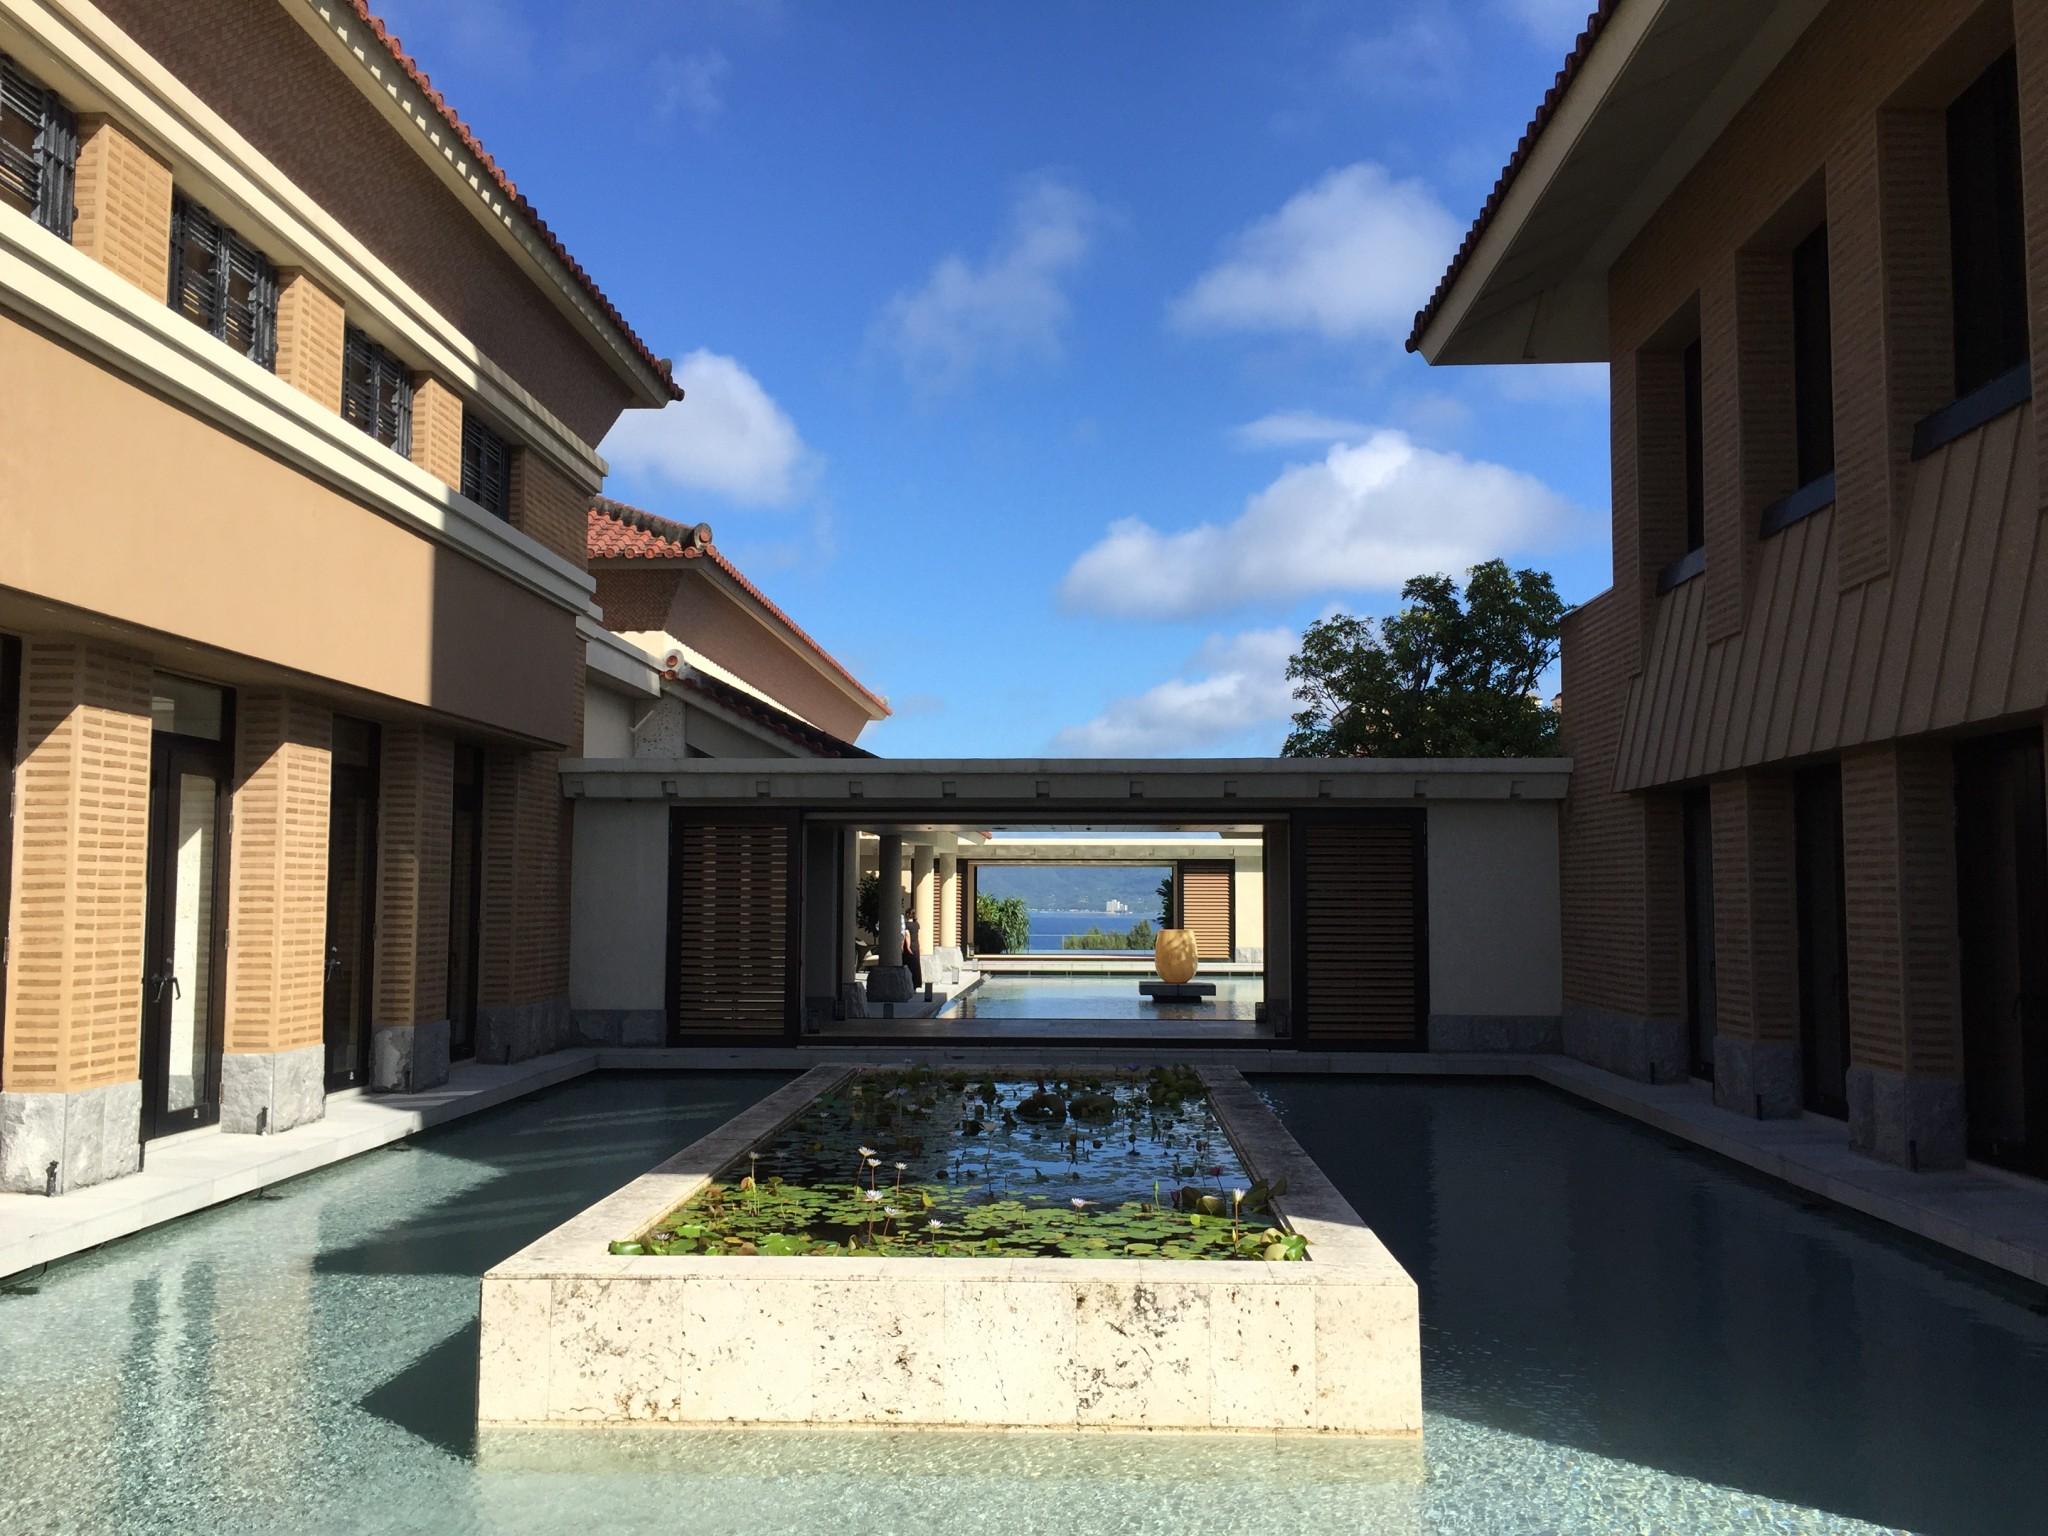 Ritz-Carlton Okinawa 5